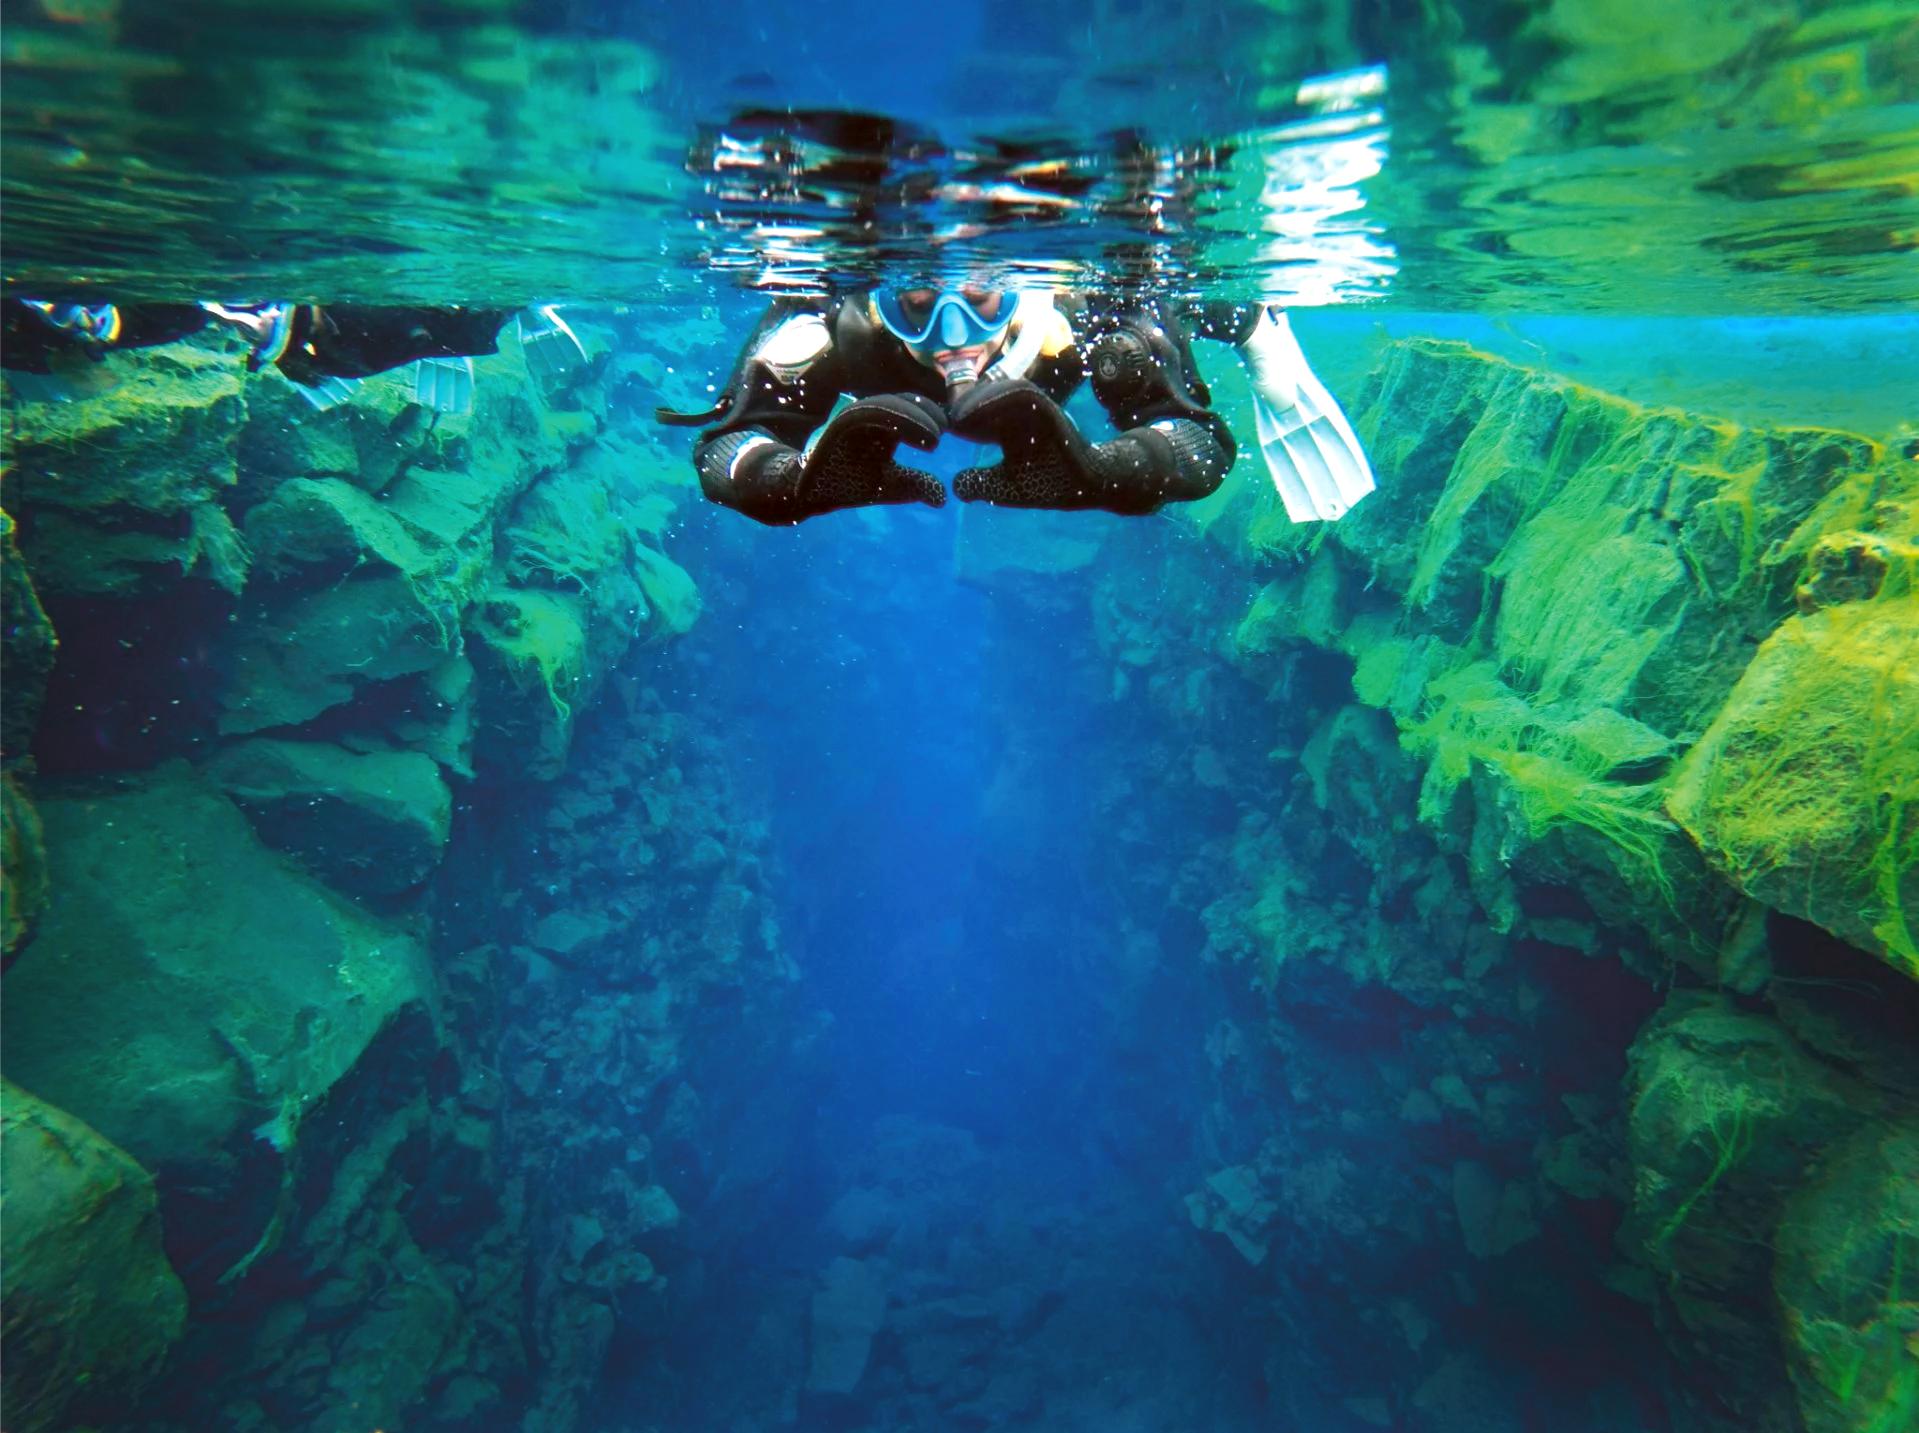 Snorkling mellom kontinenter i Silfra | Gratis undervannsbilder